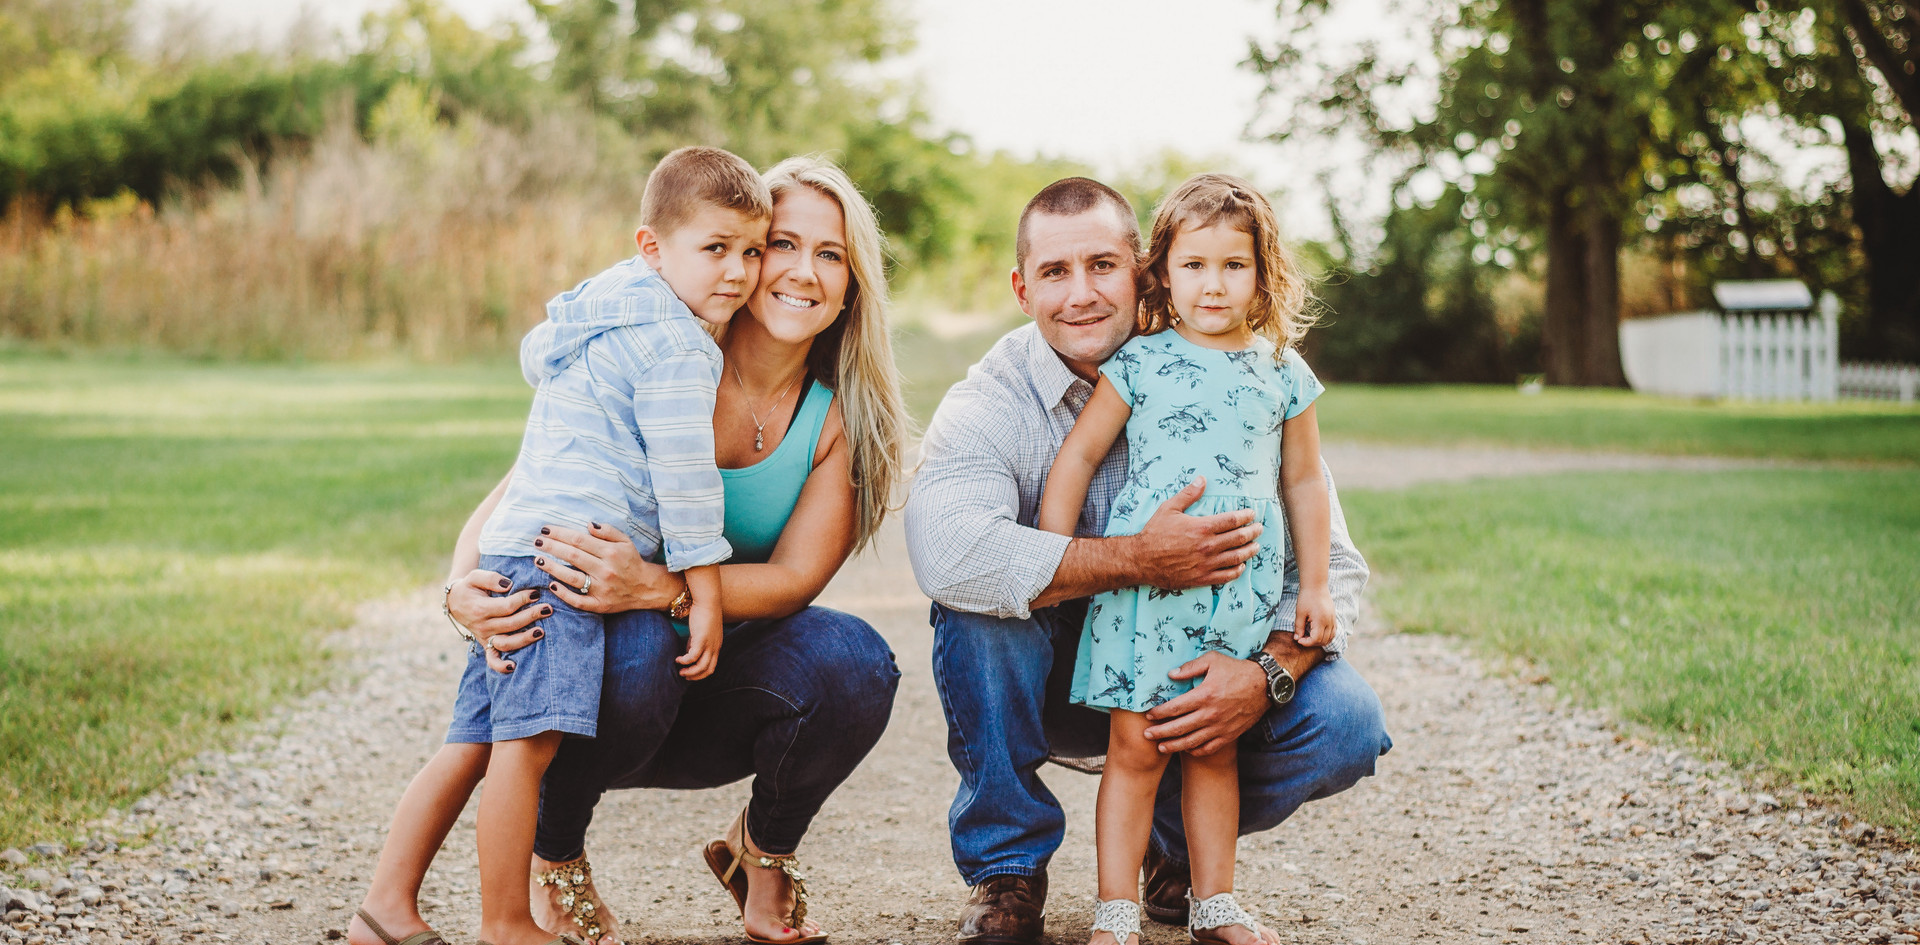 KSP_Family_AngelaRobinson_08_16_05.jpg